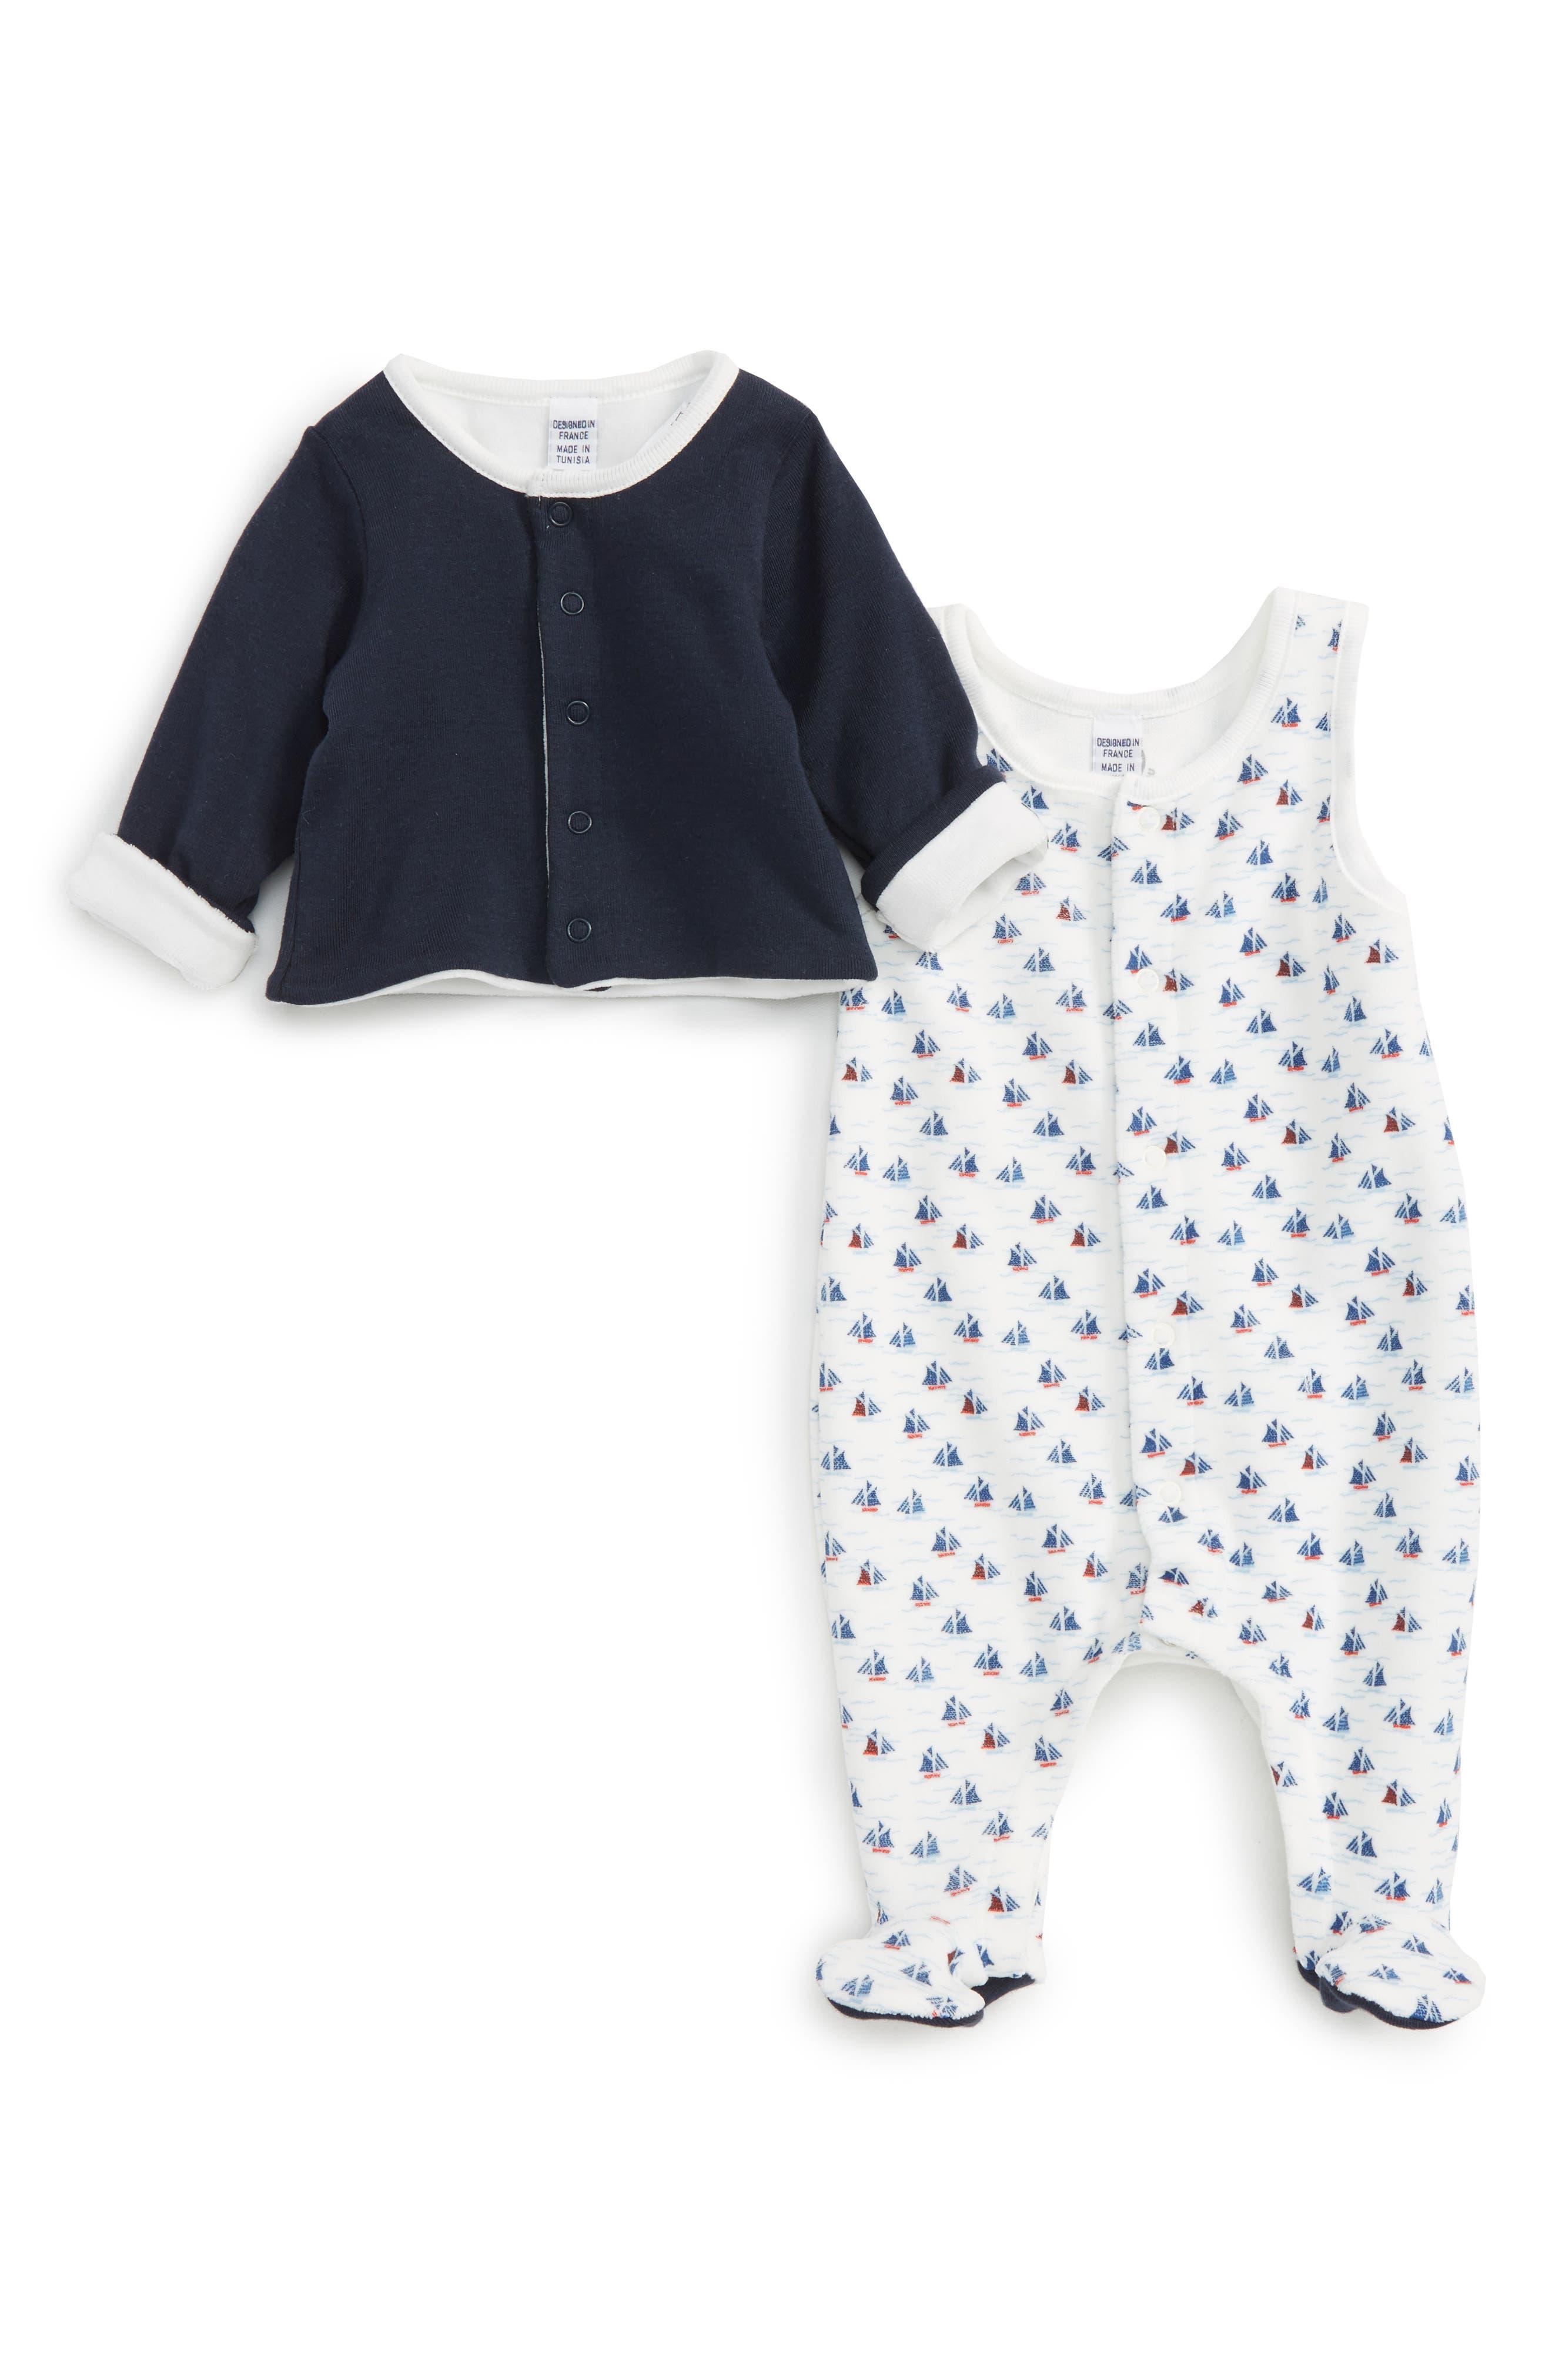 Alternate Image 1 Selected - Petit Bateau Footie & Jacket Set (Baby Boys)